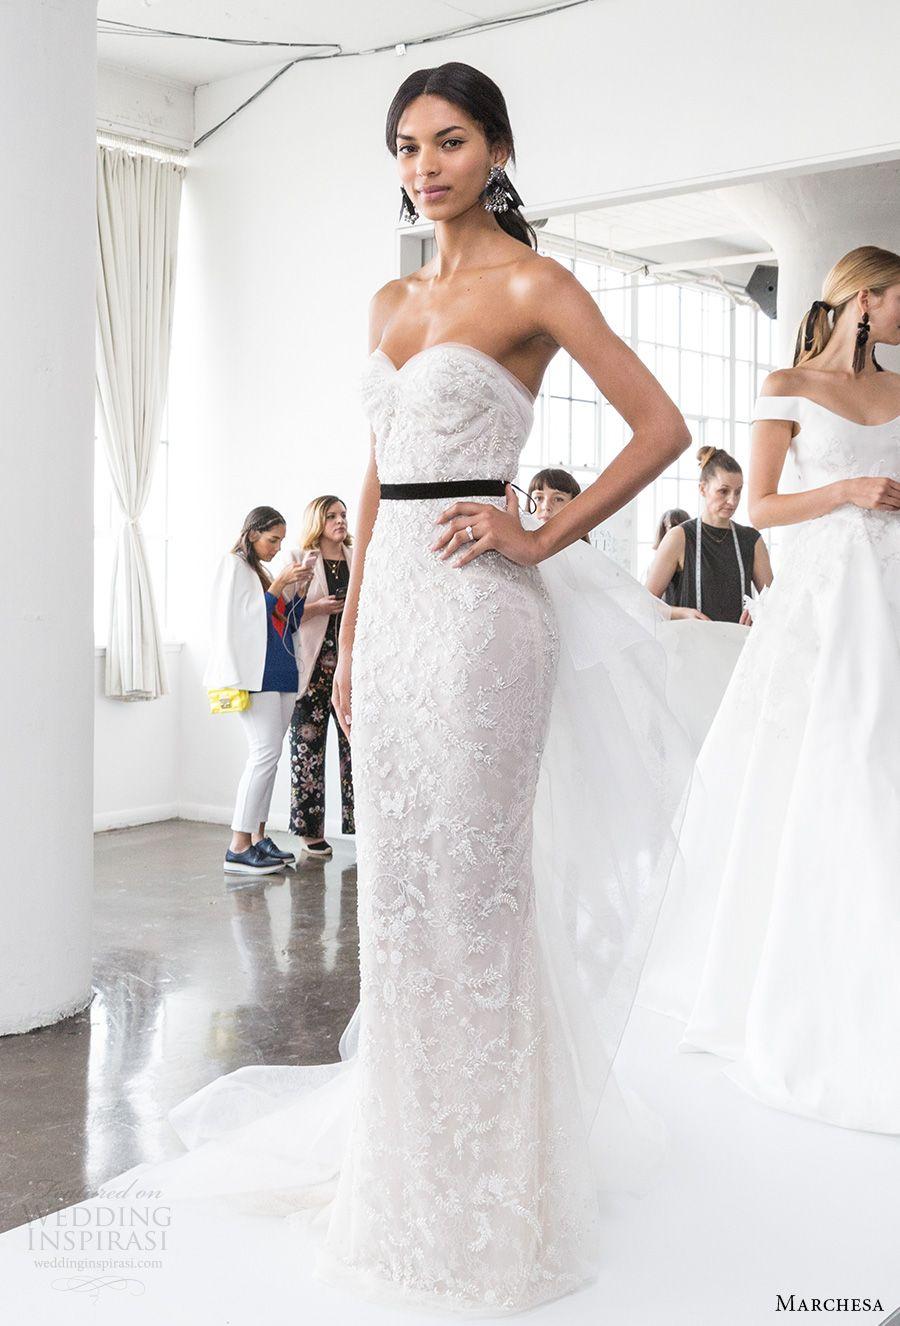 Marchesa bridal spring 2018 wedding dresses new york bridal marchesa bridal spring 2018 wedding dresses new york bridal fashion week presentation lookbook wedding inspirasi junglespirit Images